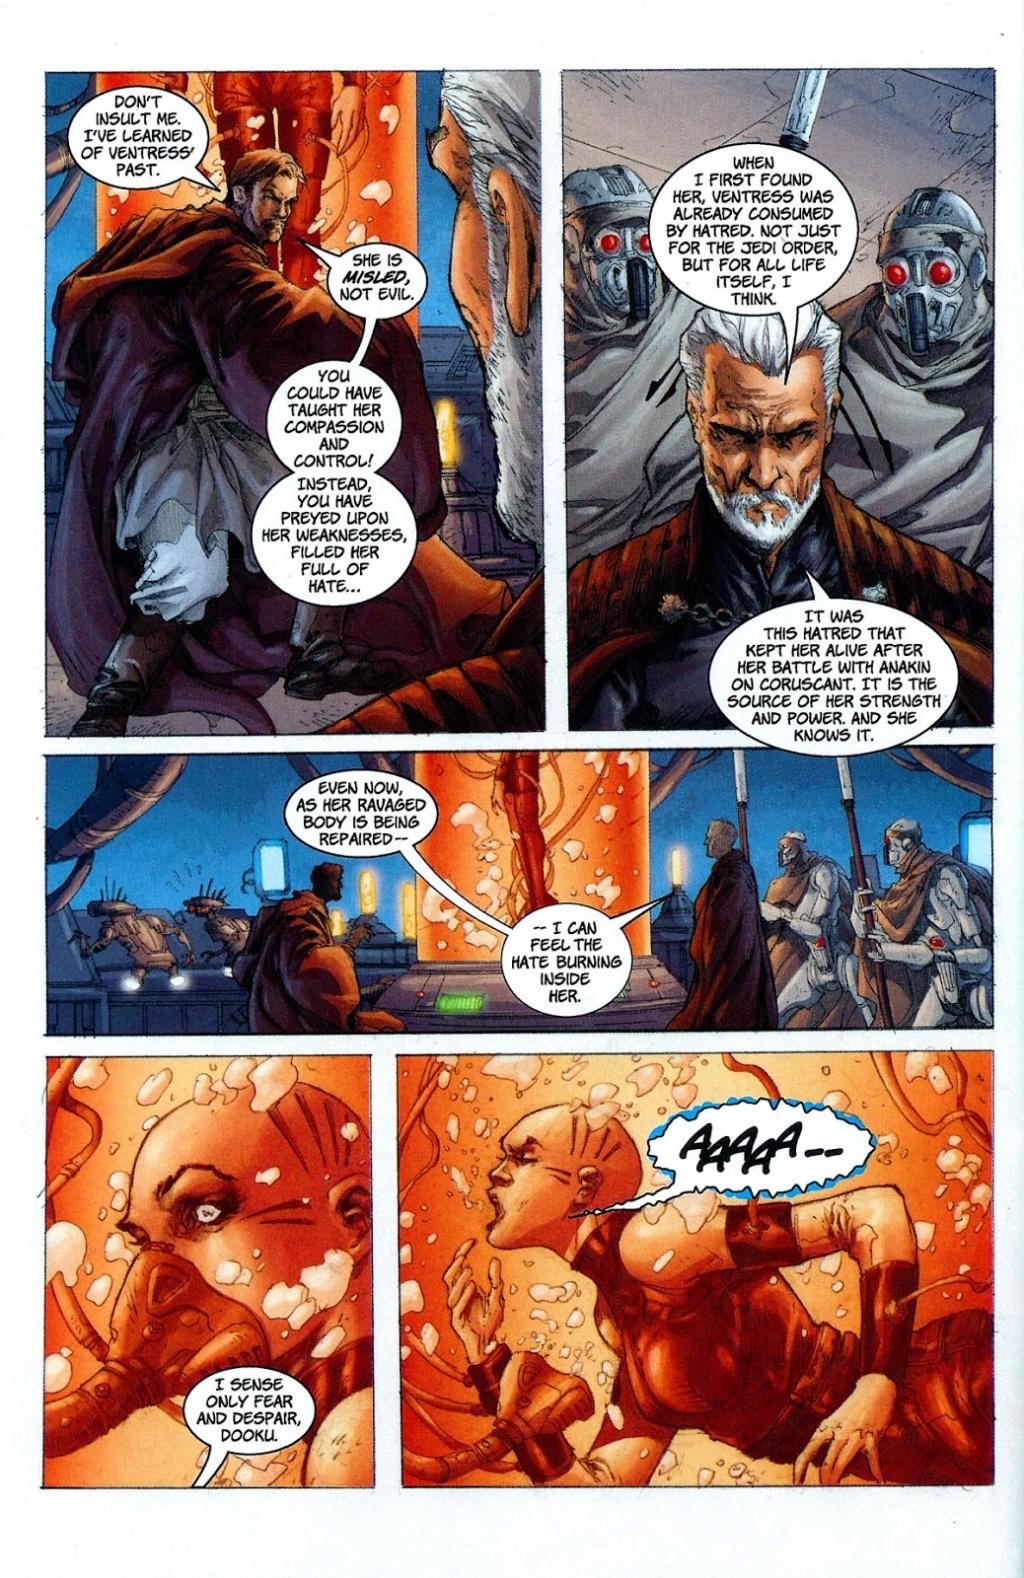 SS - Mace Windu (KnightfallVader / alex s) vs Darth Tyranus (Darth Dorin's Baneling)  Rco00410